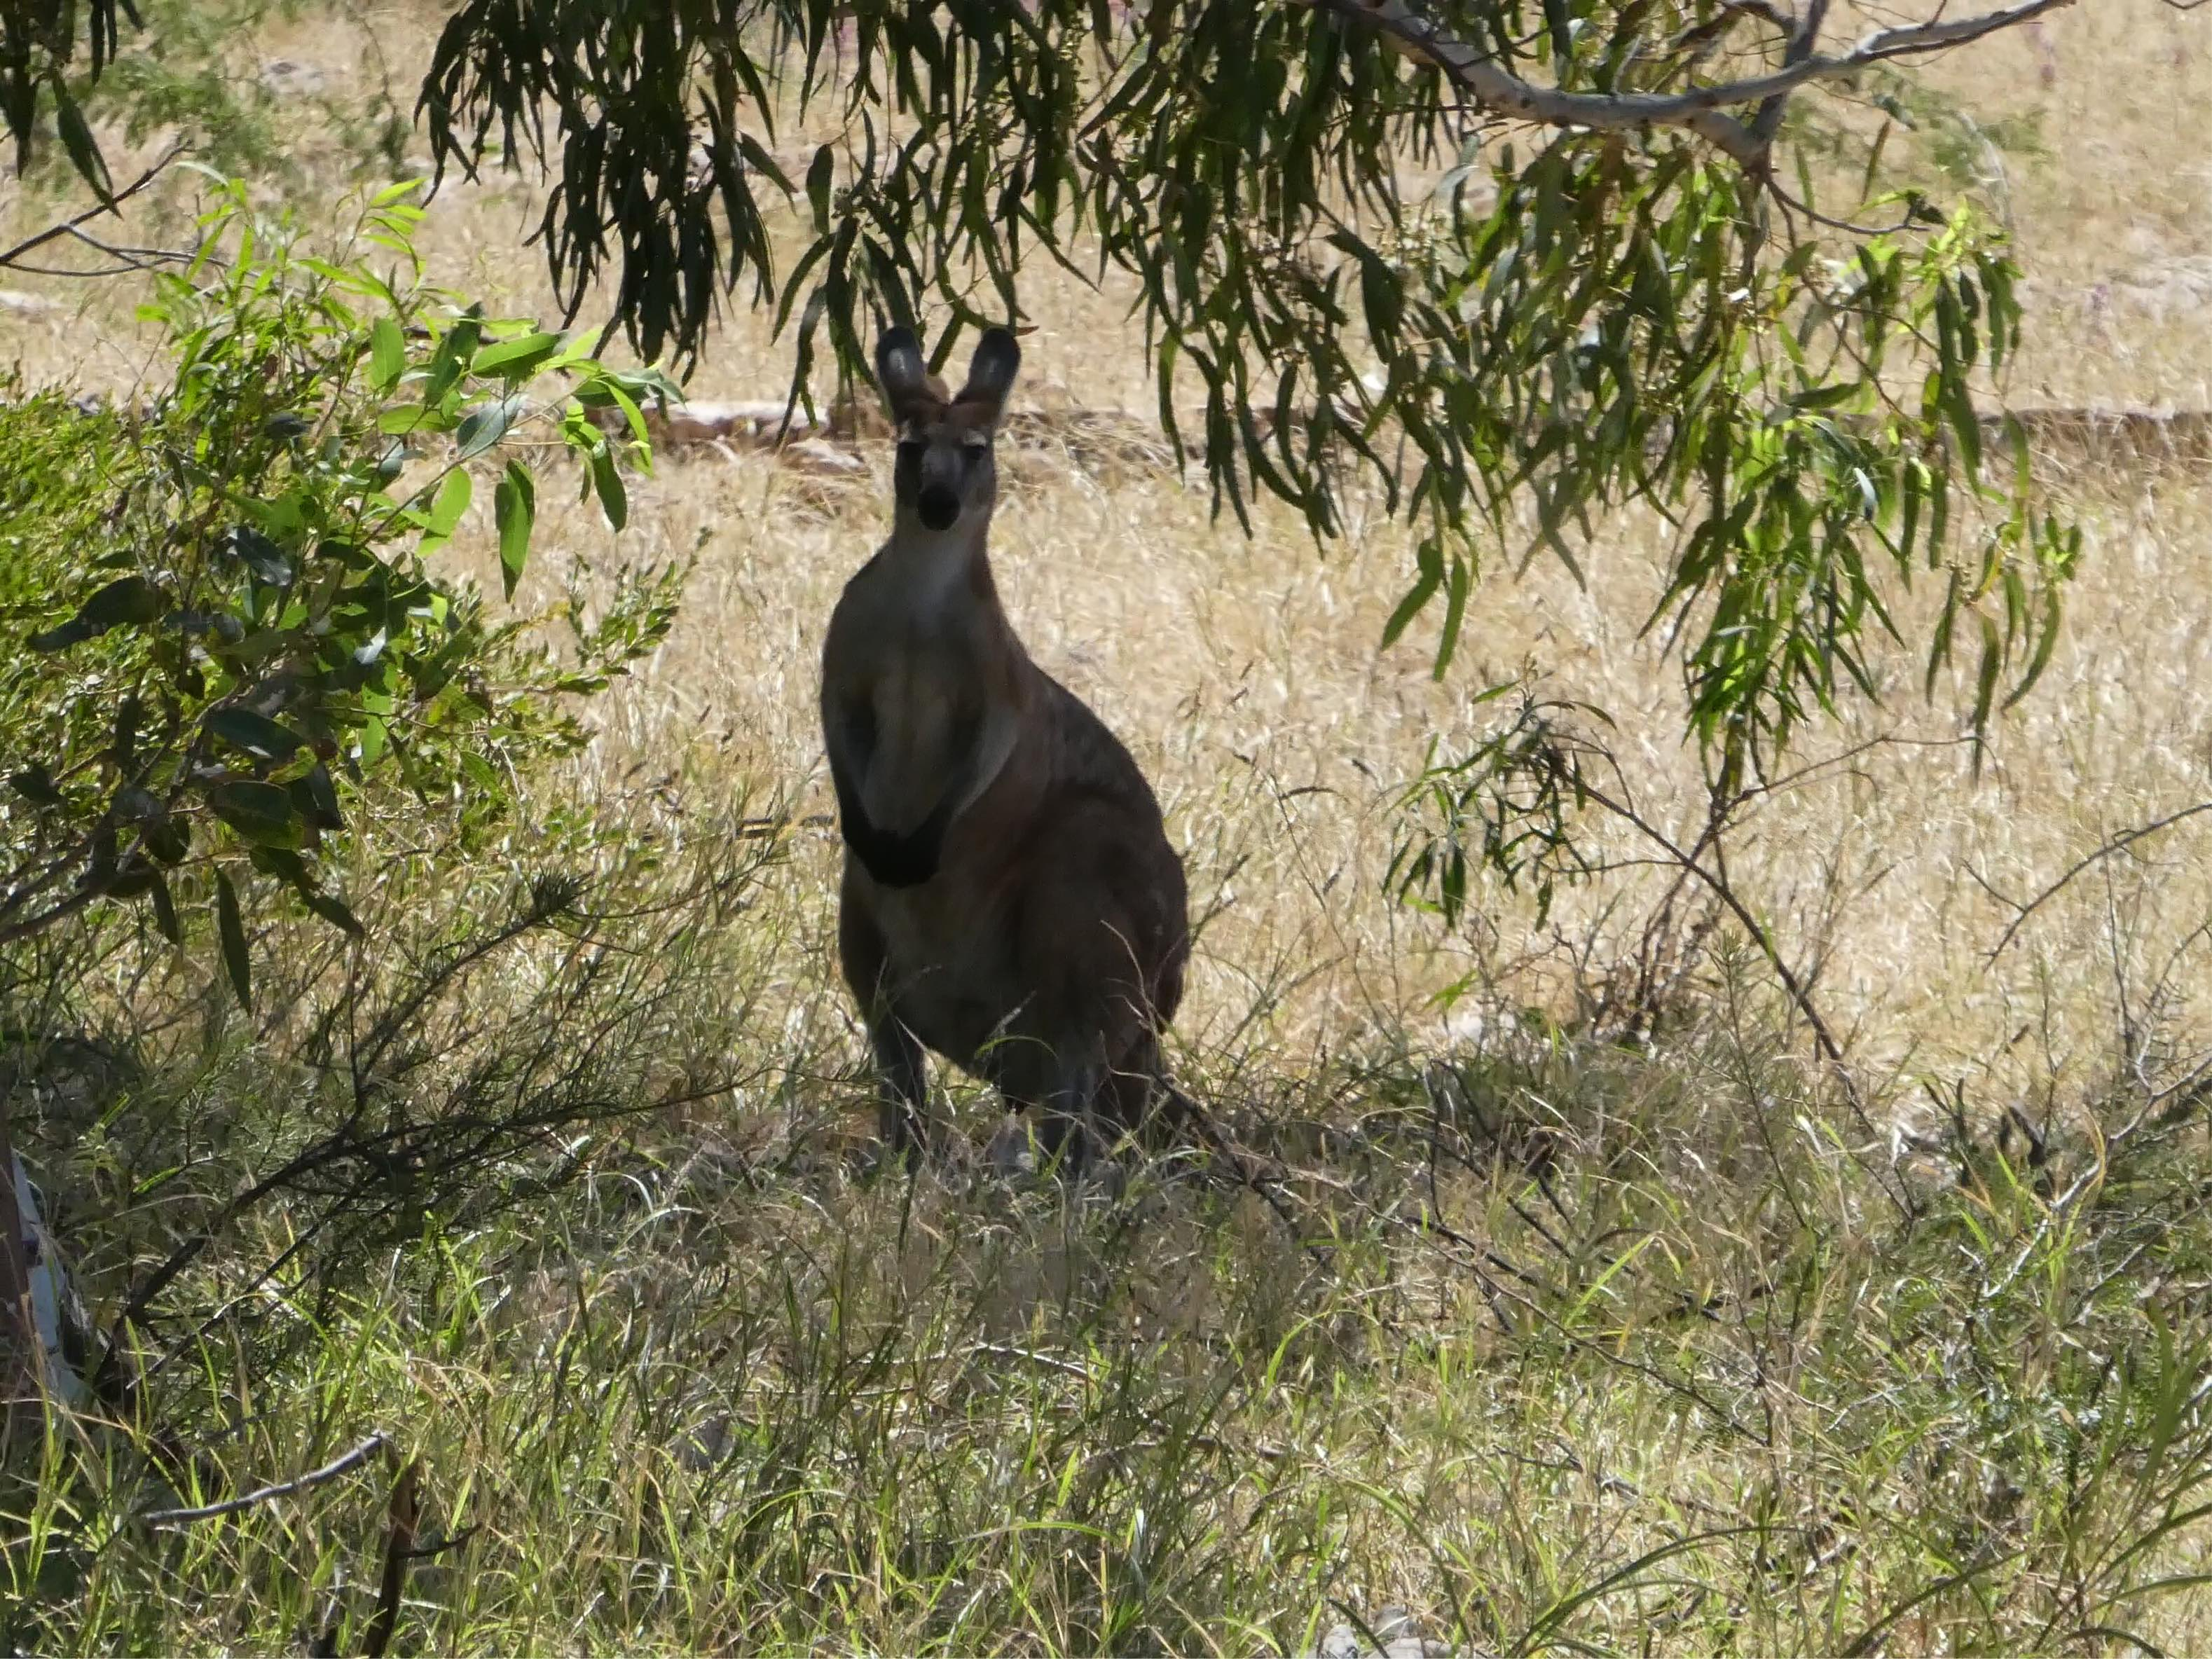 Riesenkänguru Australien